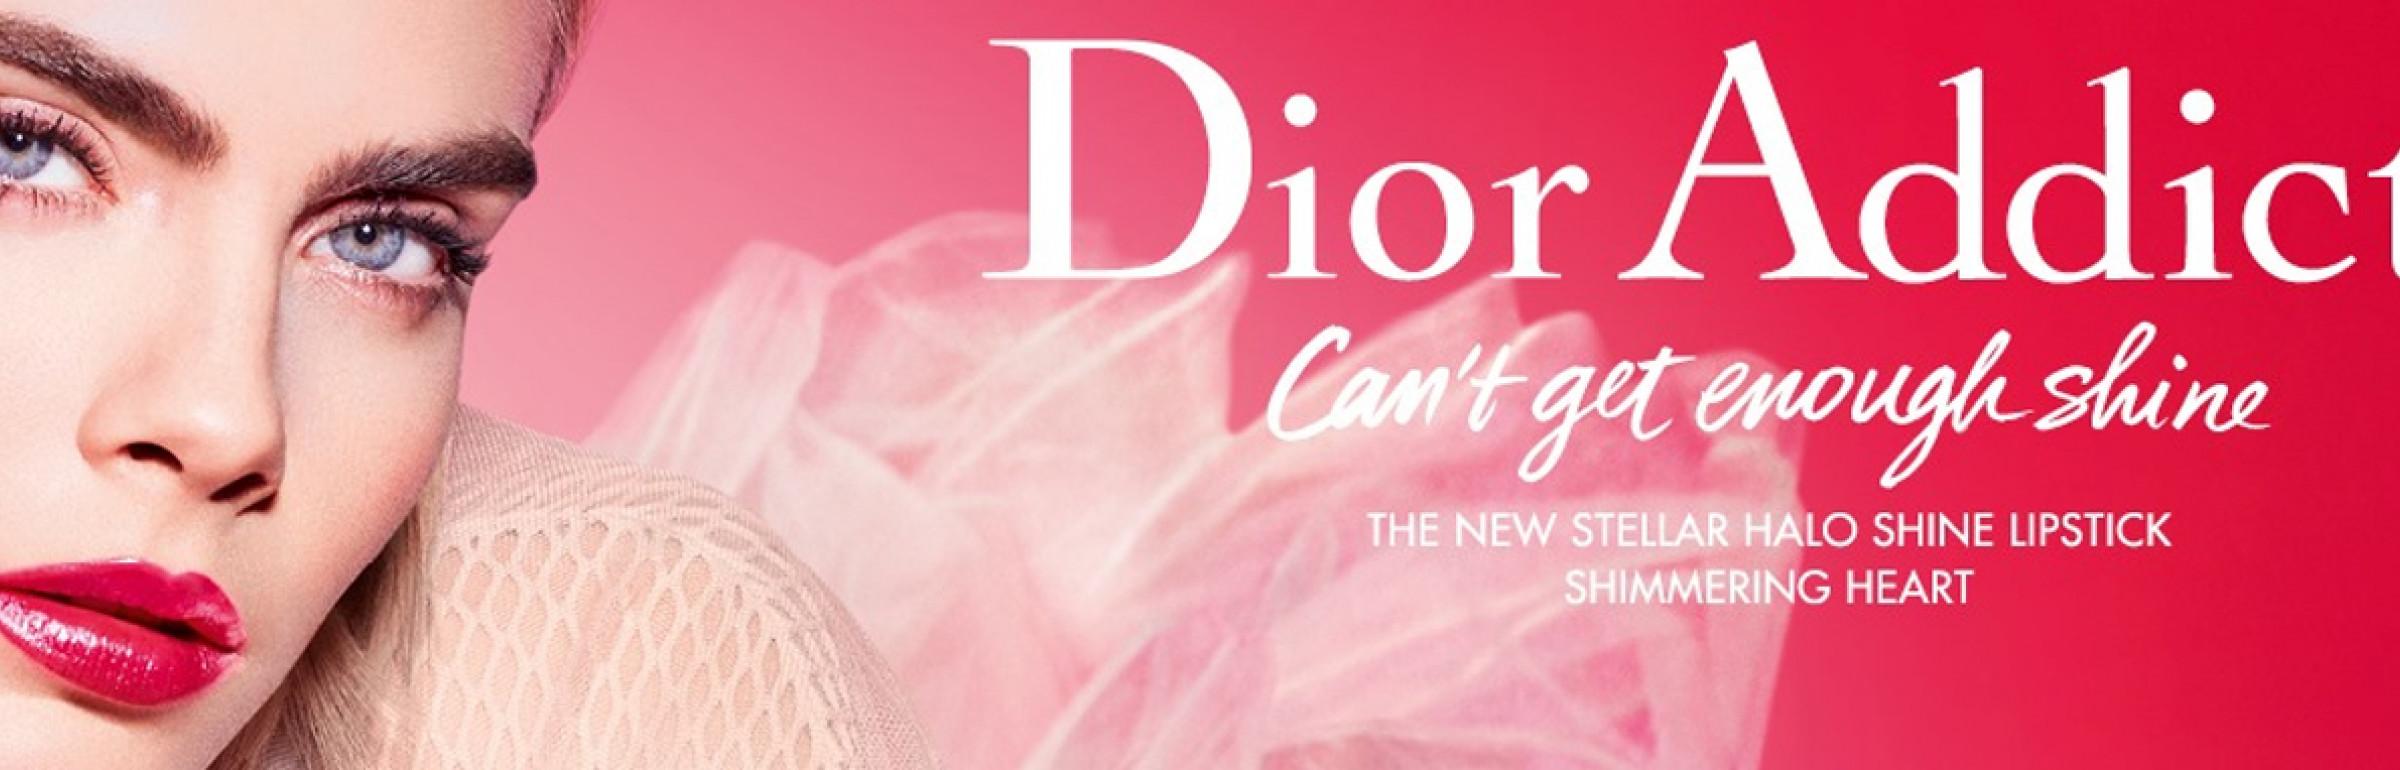 Banner Maison Parfum Christian Dior